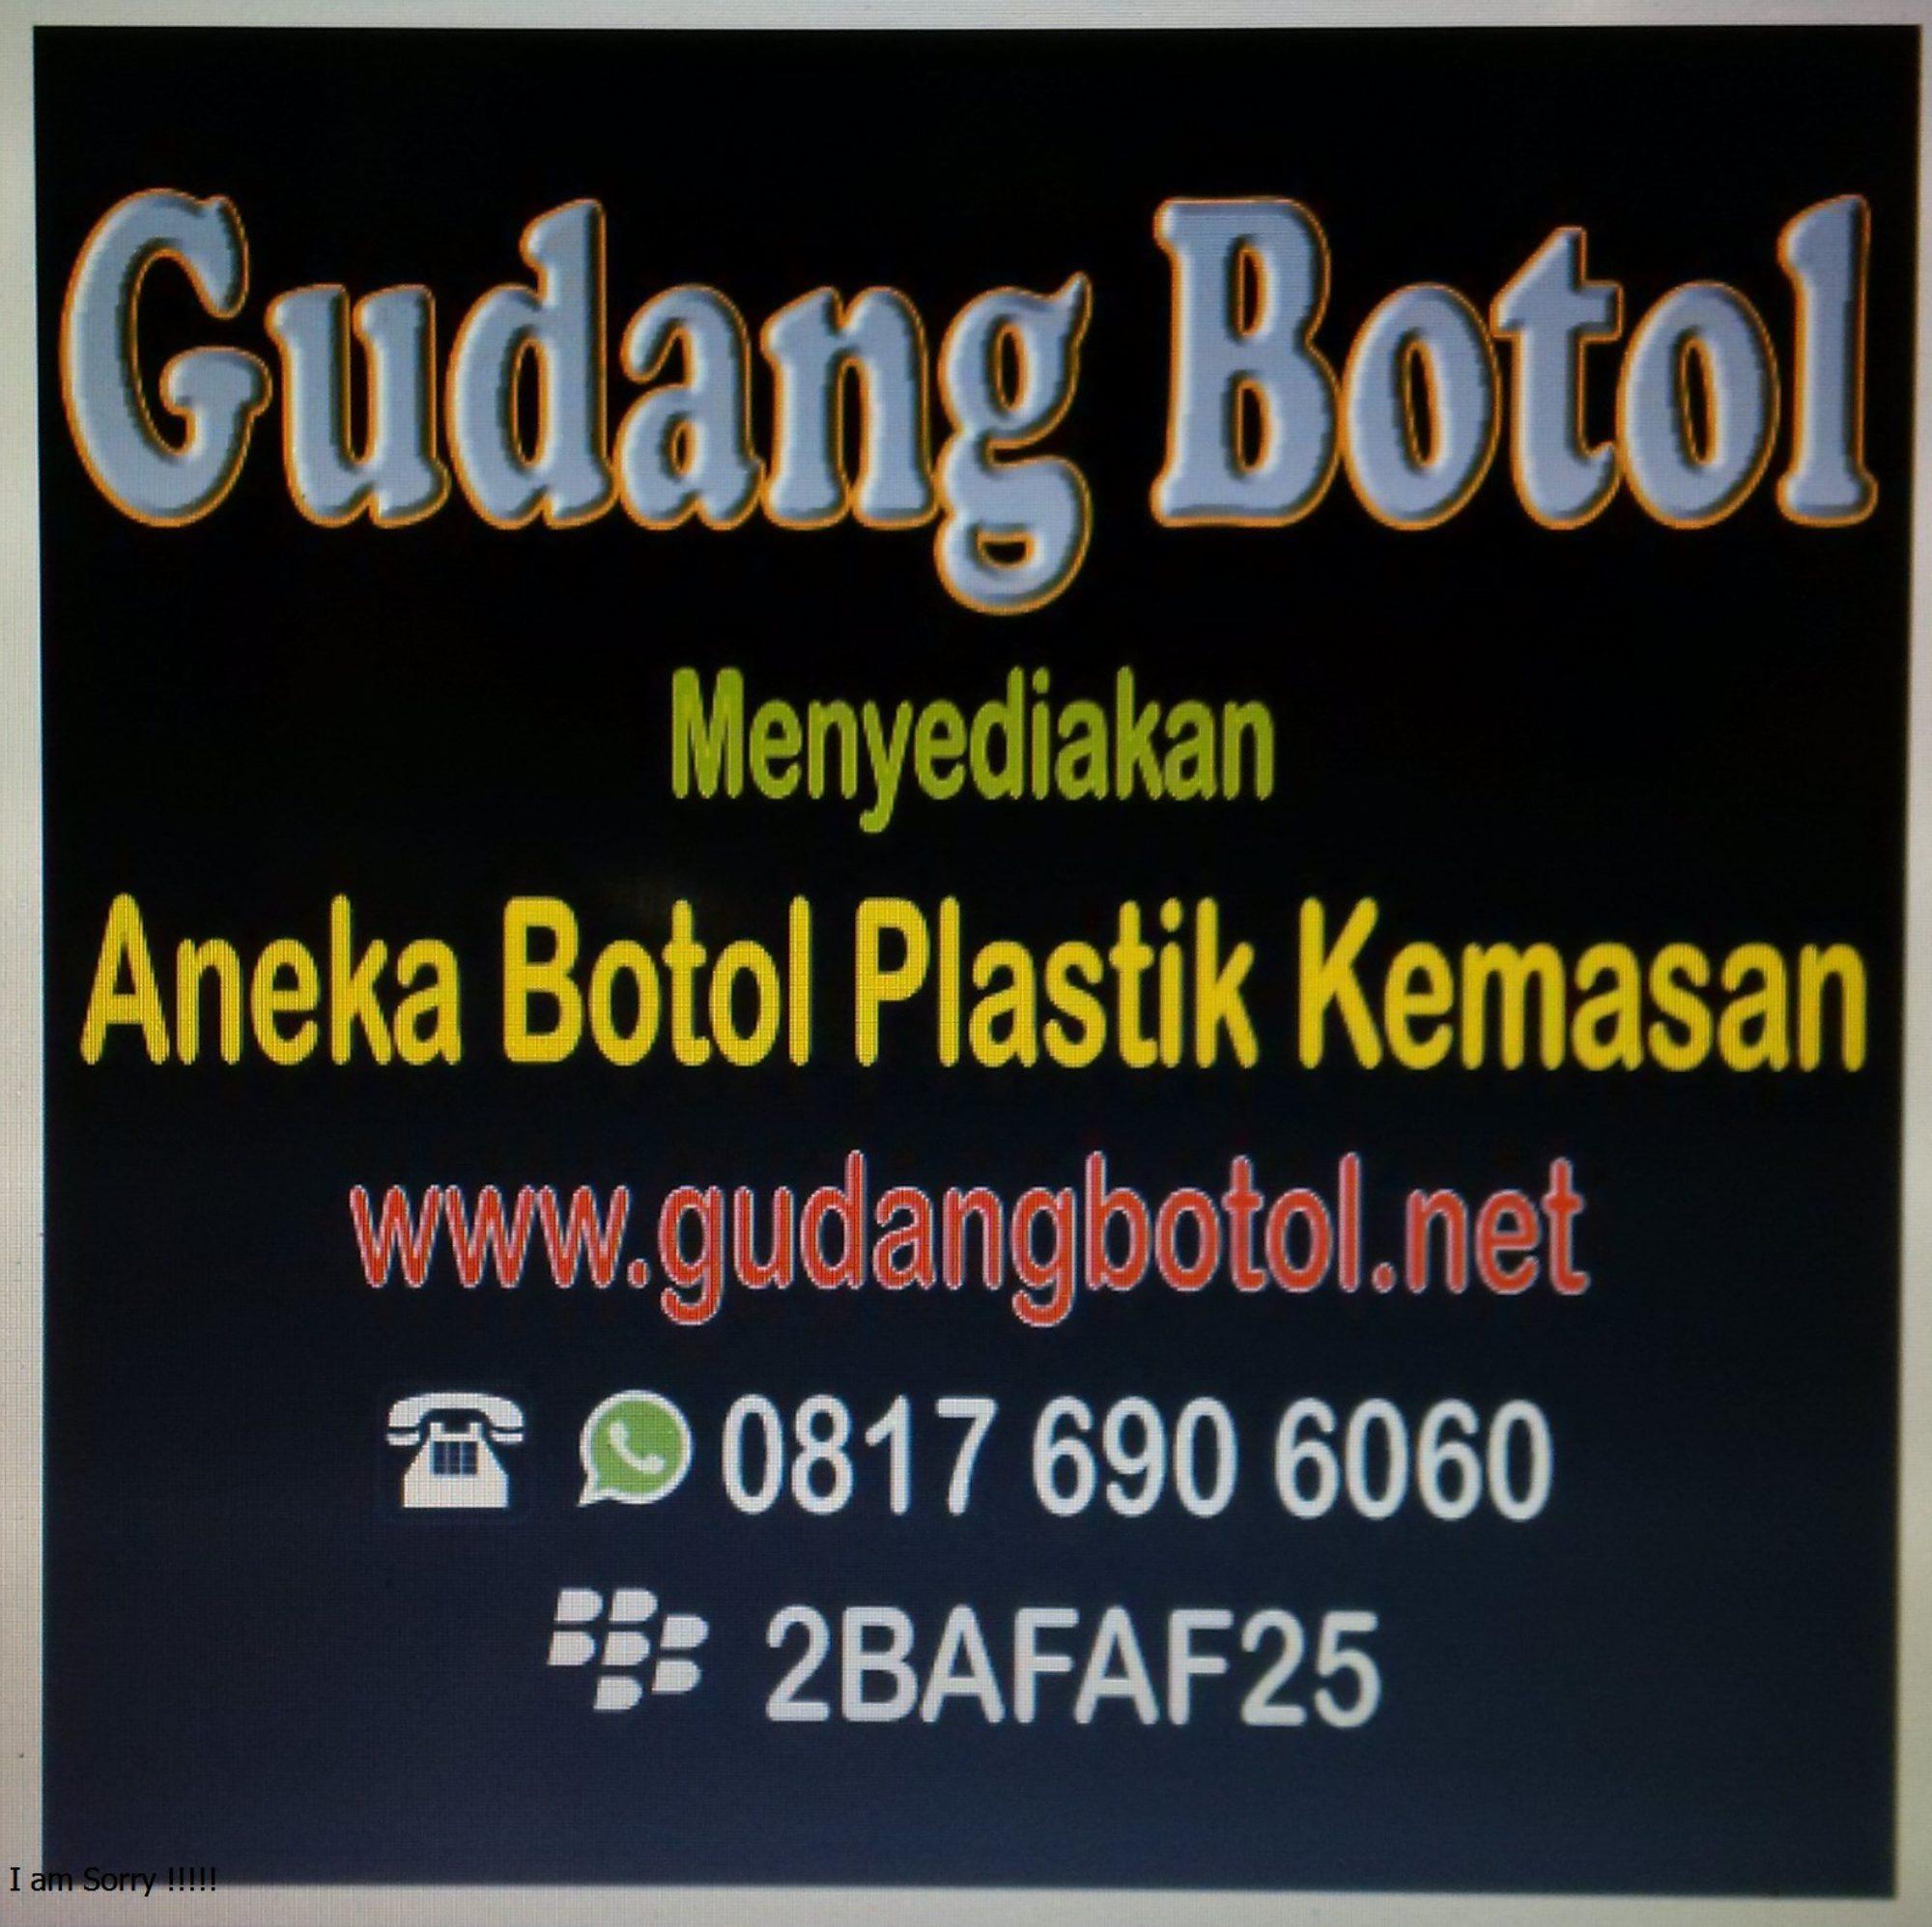 GudangBotol.net